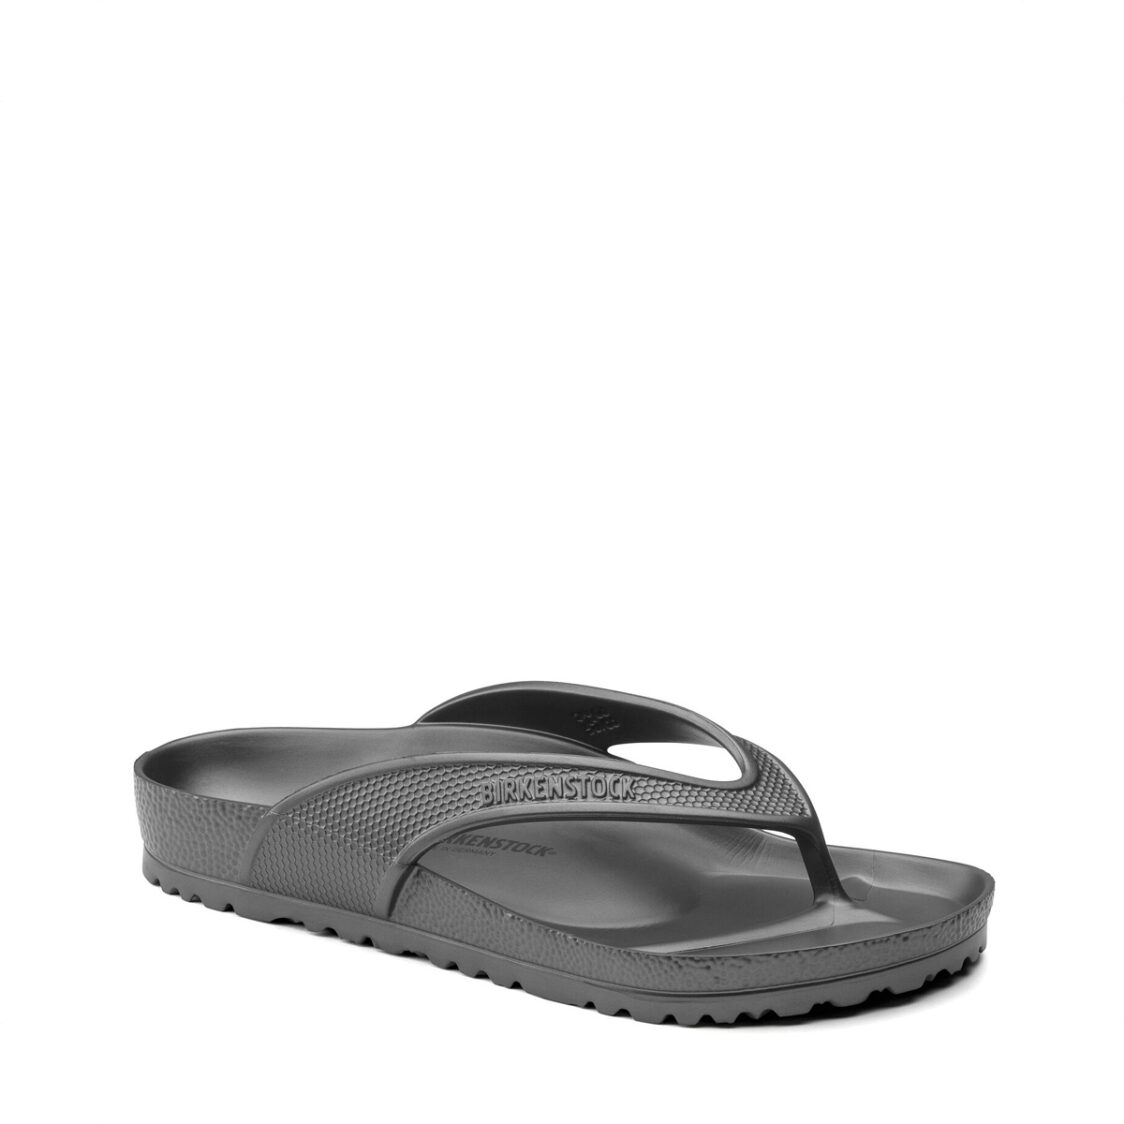 Birkenstock Honolulu EVA Unisex Regular Width Sandals Metallic Anthracite